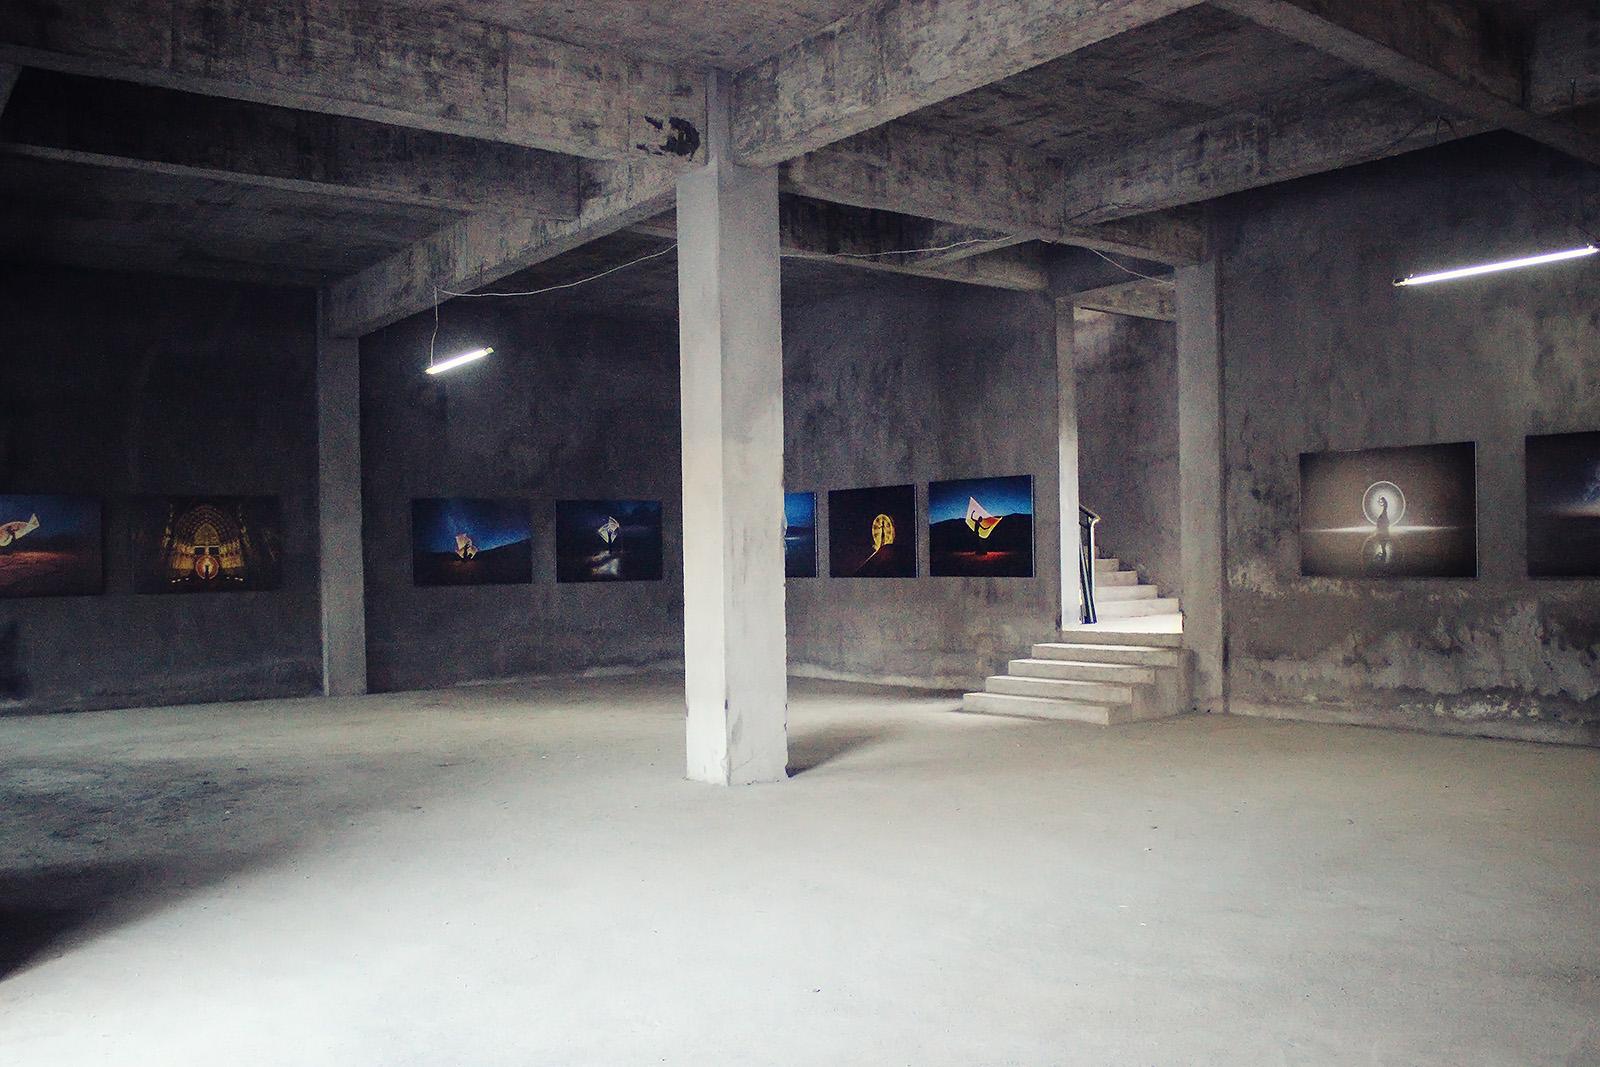 light-painting-exhibition-china-eric-pare-kim-henry-huangshan-international-photography-festival-11th-yixian-5-jpg-856o.jpg